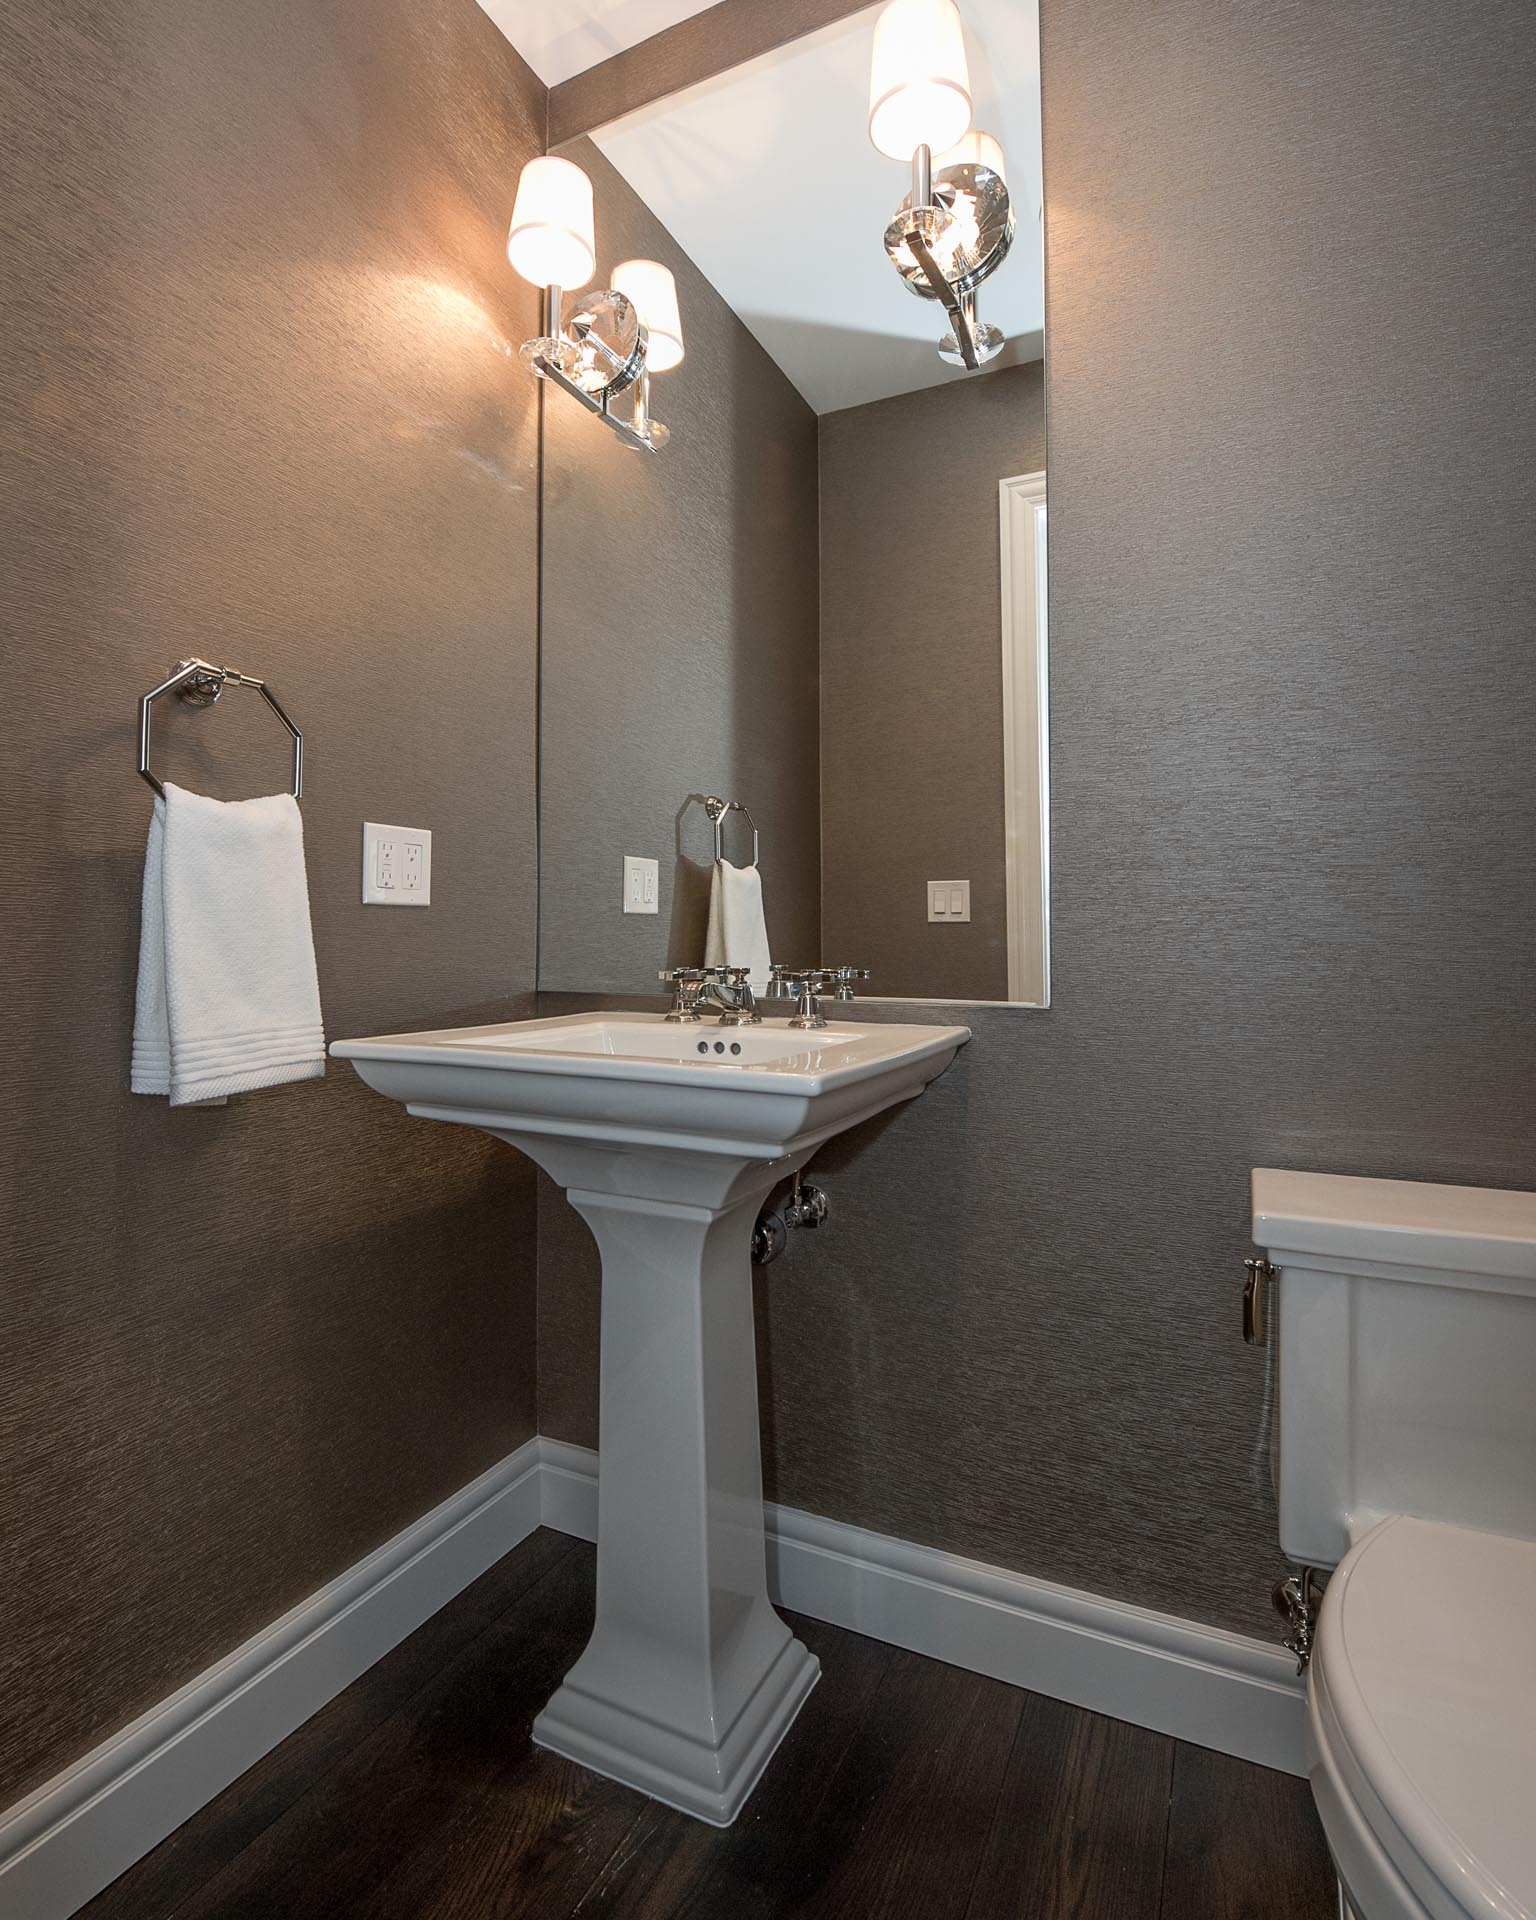 Condo Bathroom Faucet Design | H Residence | Midland, MI